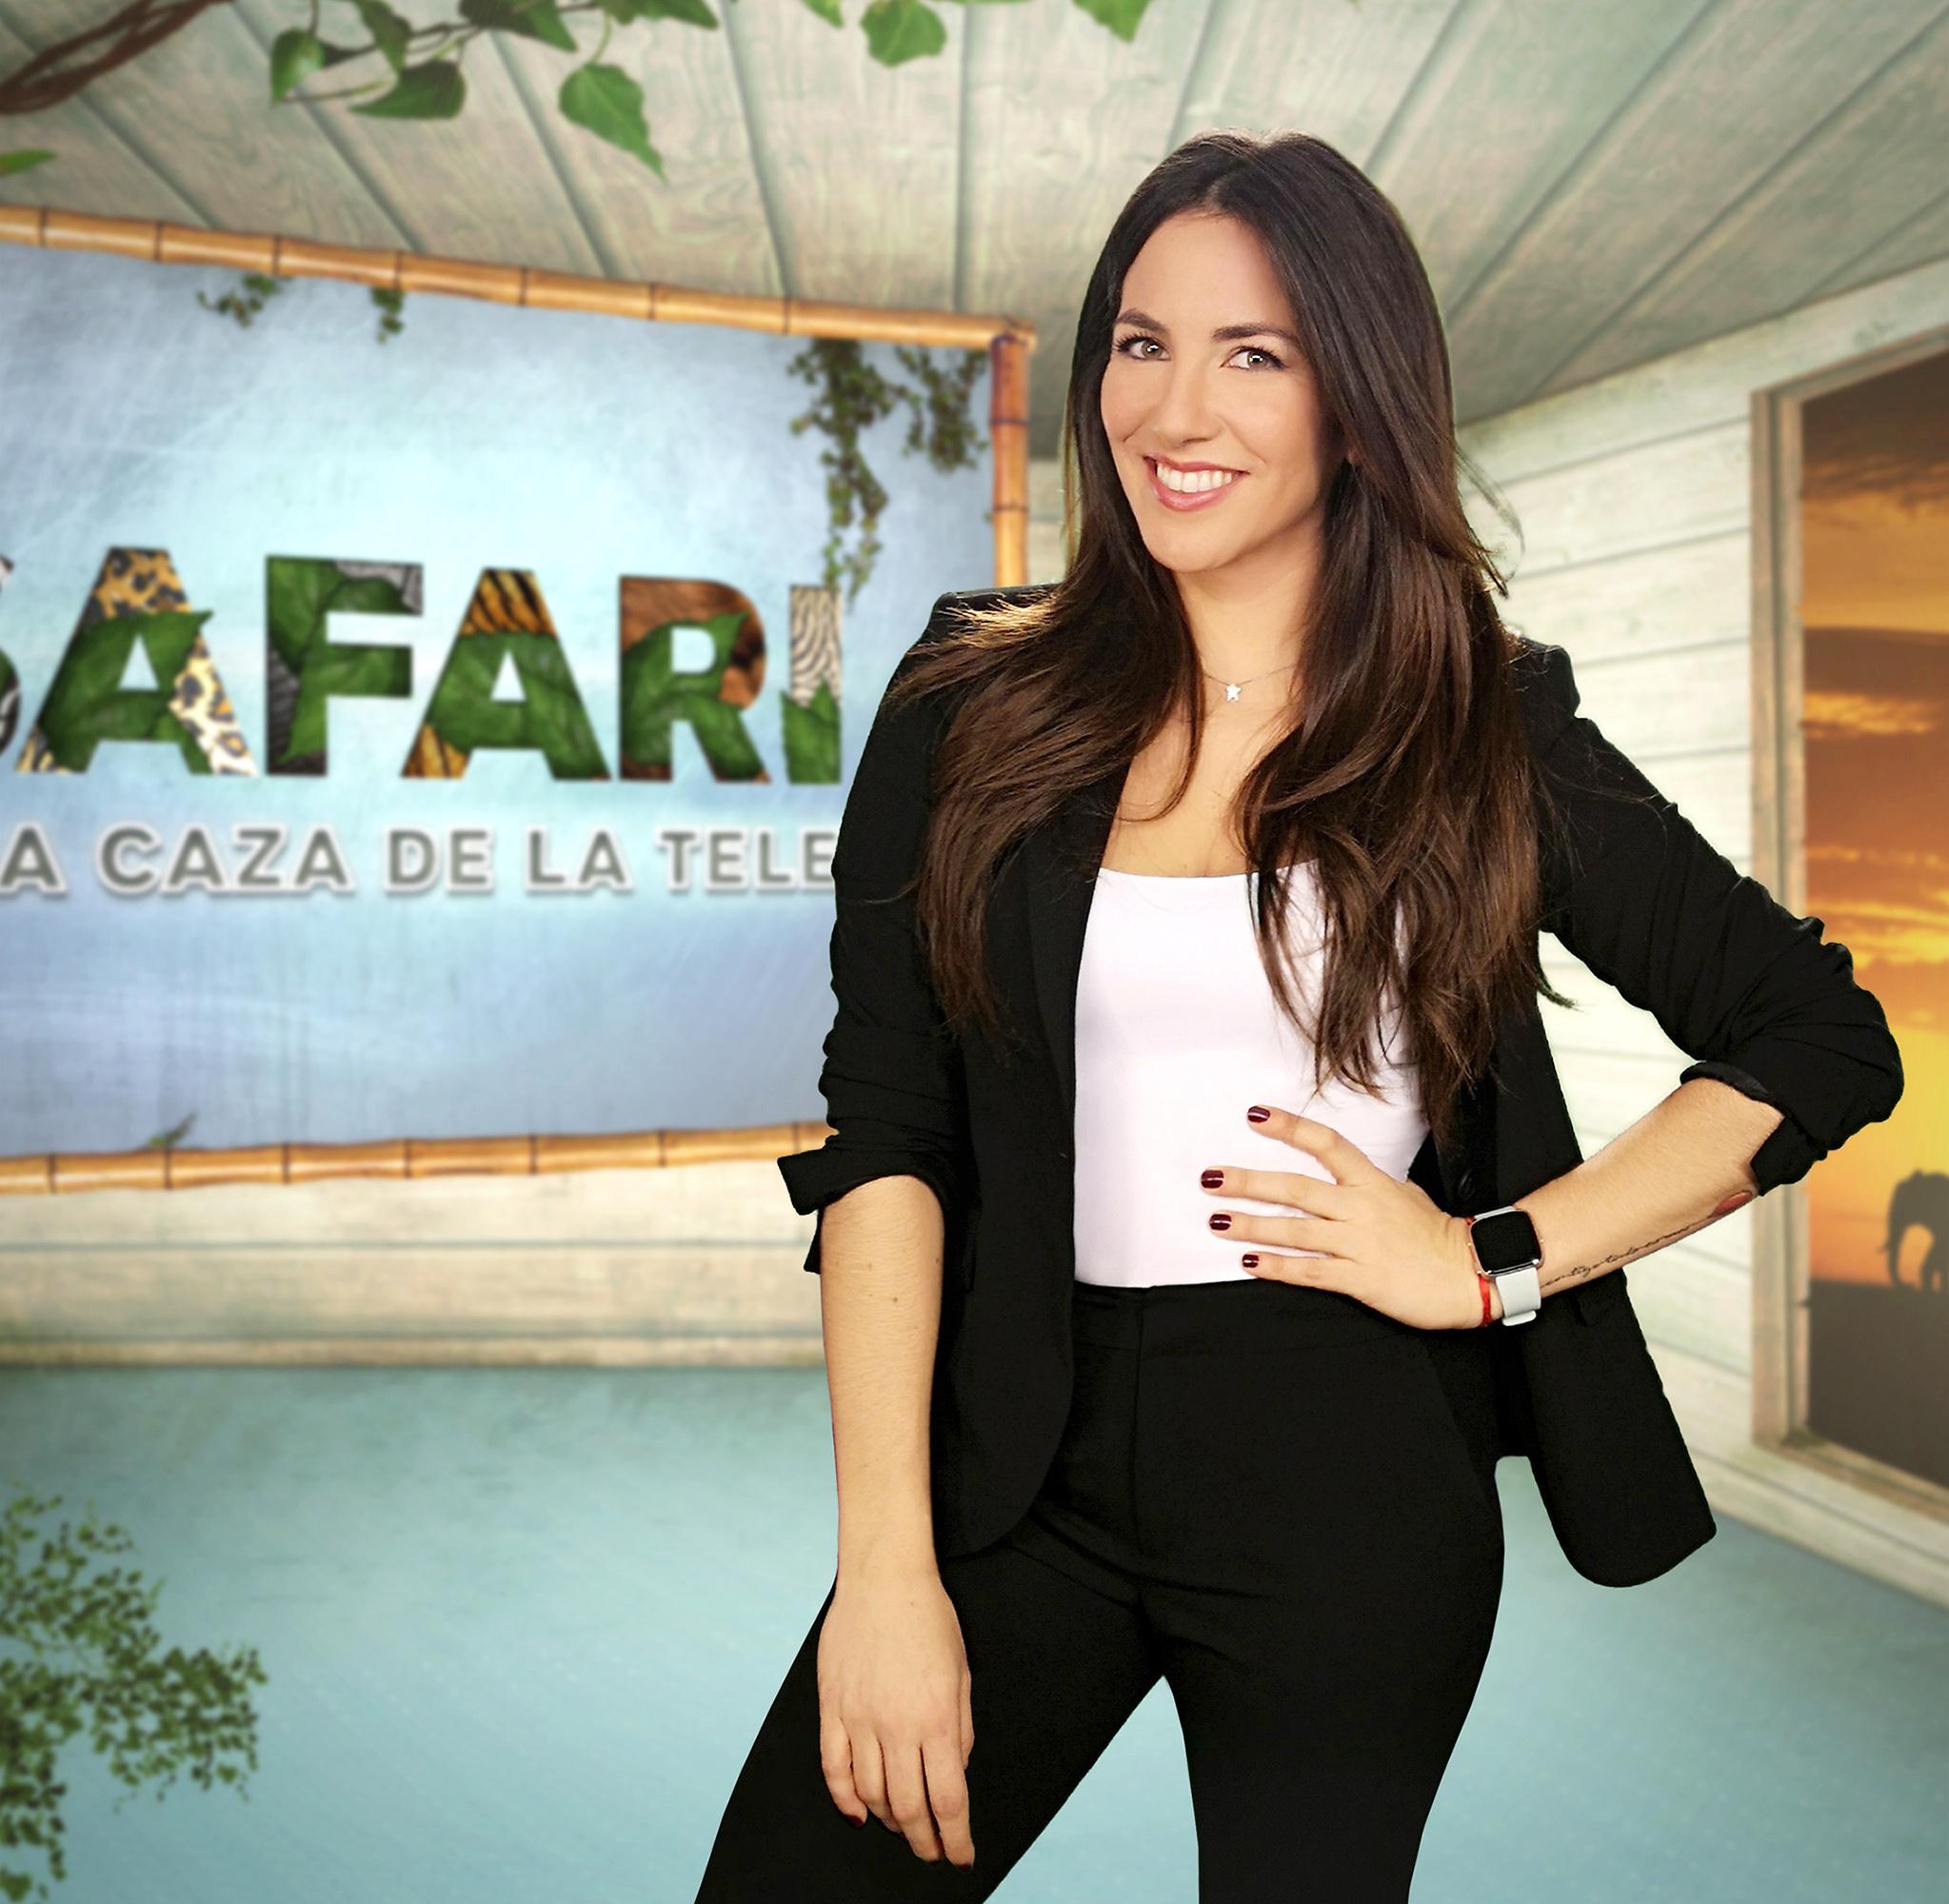 Irene Junquera presentadora de Safari